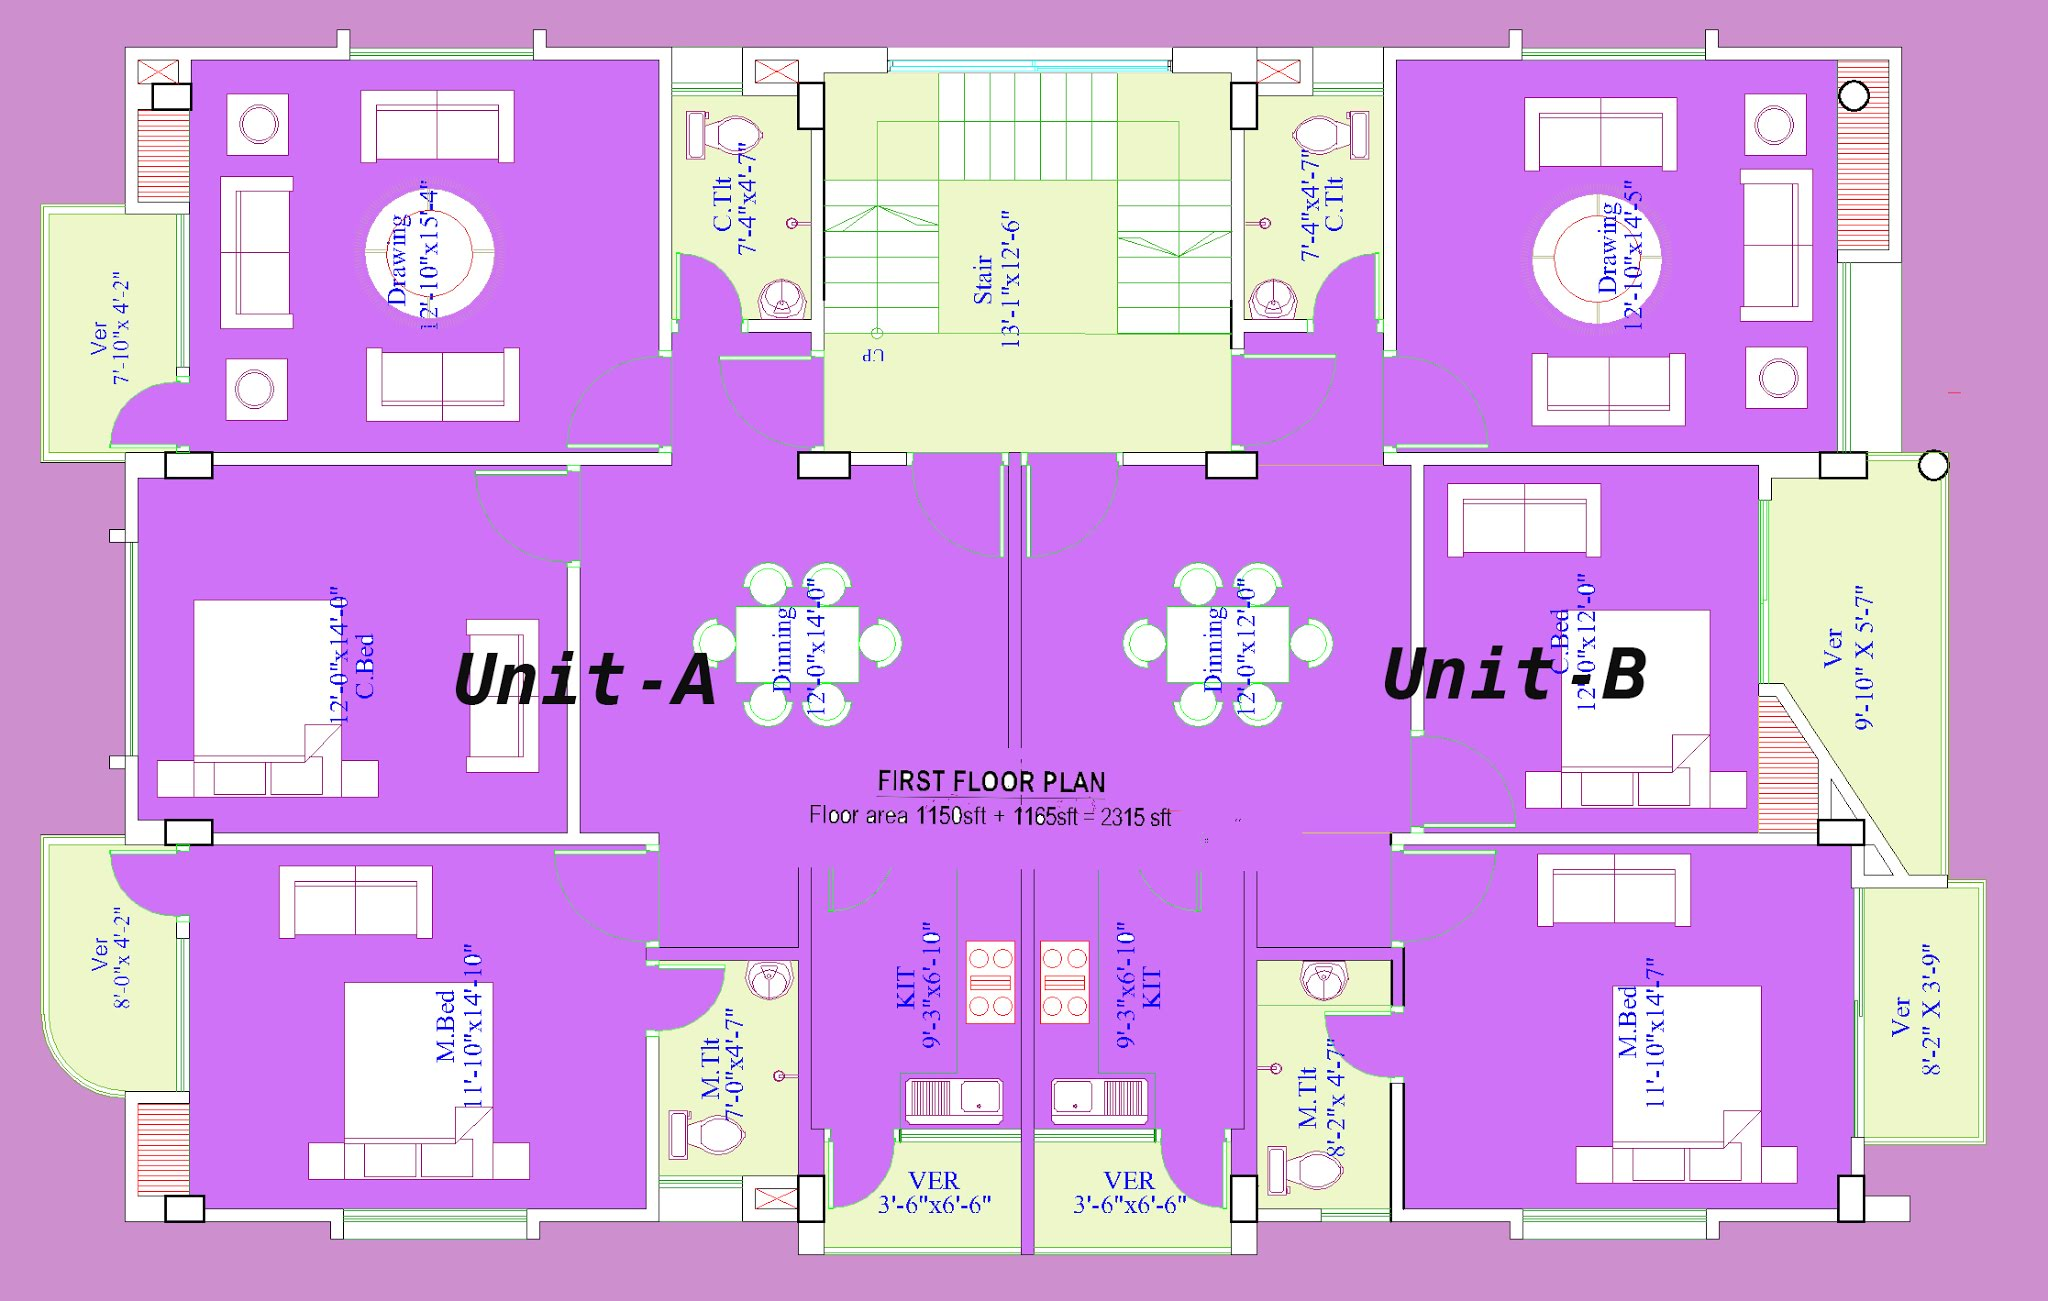 2300 sq ft first-floor plan